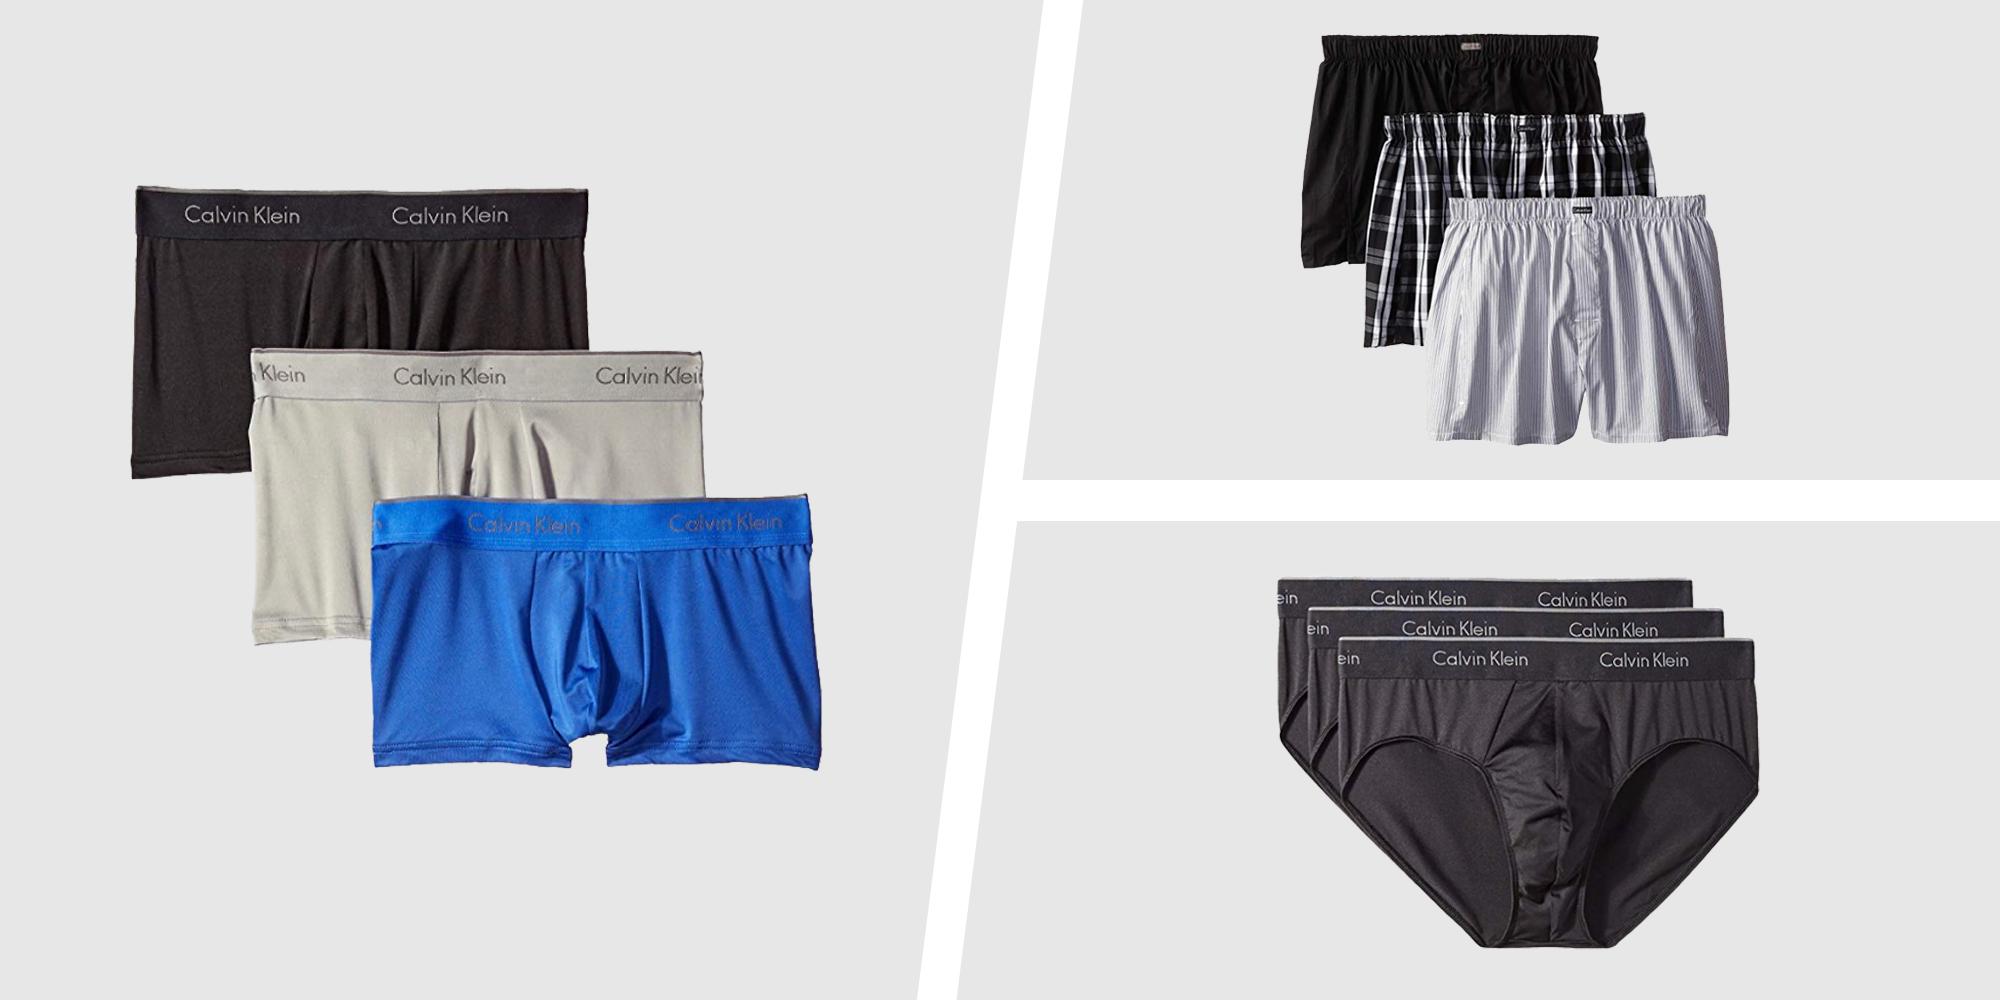 Amazon's Having a Secret Sale on Calvin Klein Men's Underwear Packs